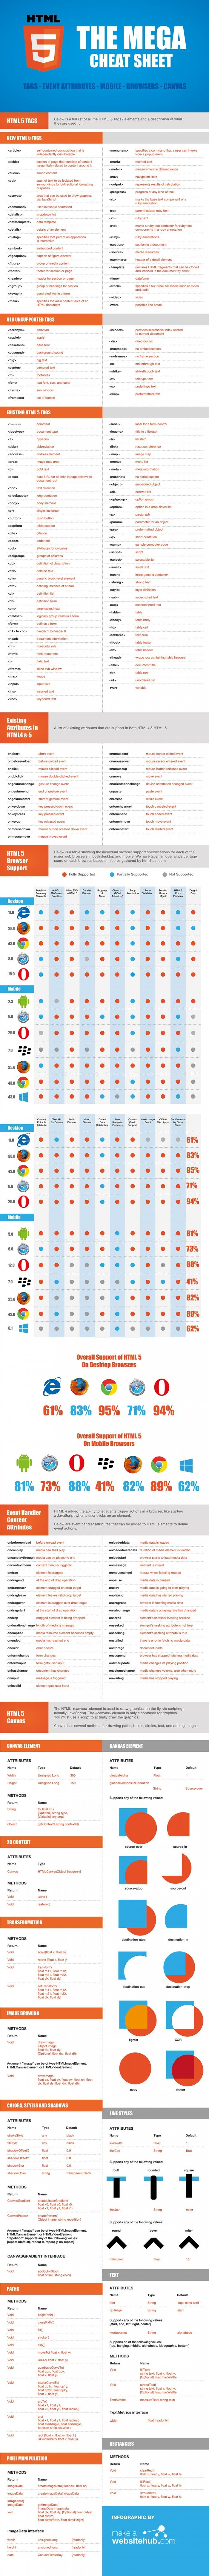 The HTML 5 Mega Cheat Sheet